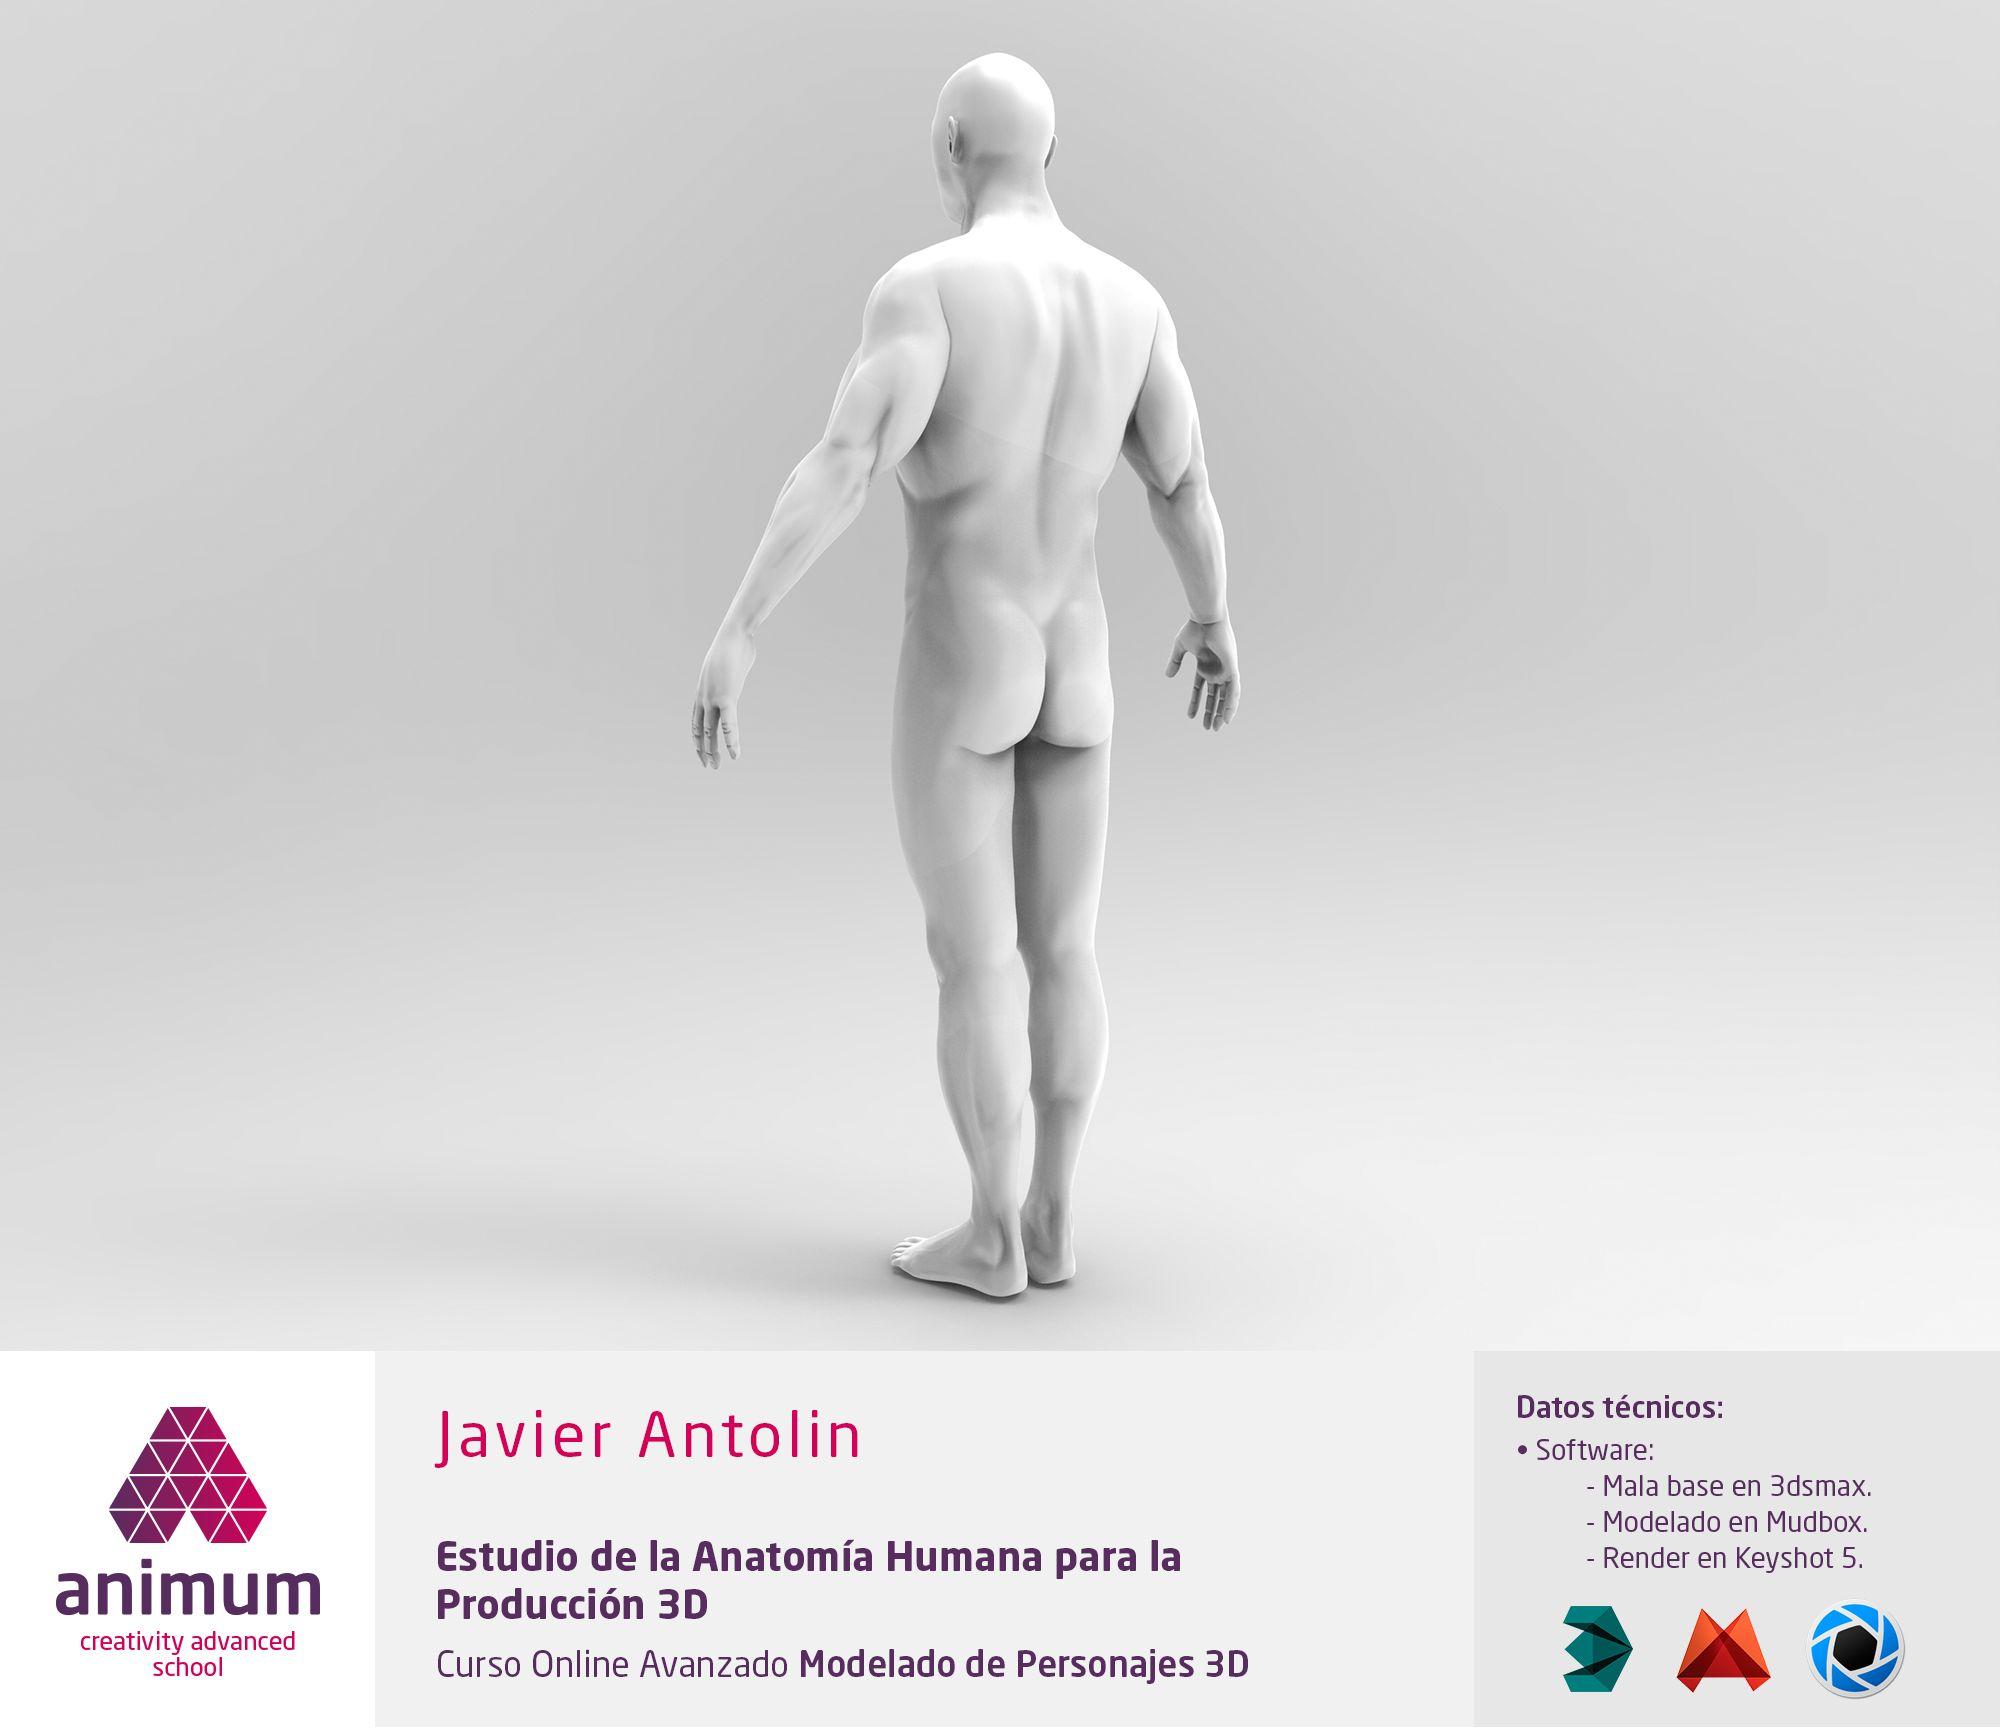 Estudio de anatomía humana para producción 3D. Vista 3/4 posterior ...